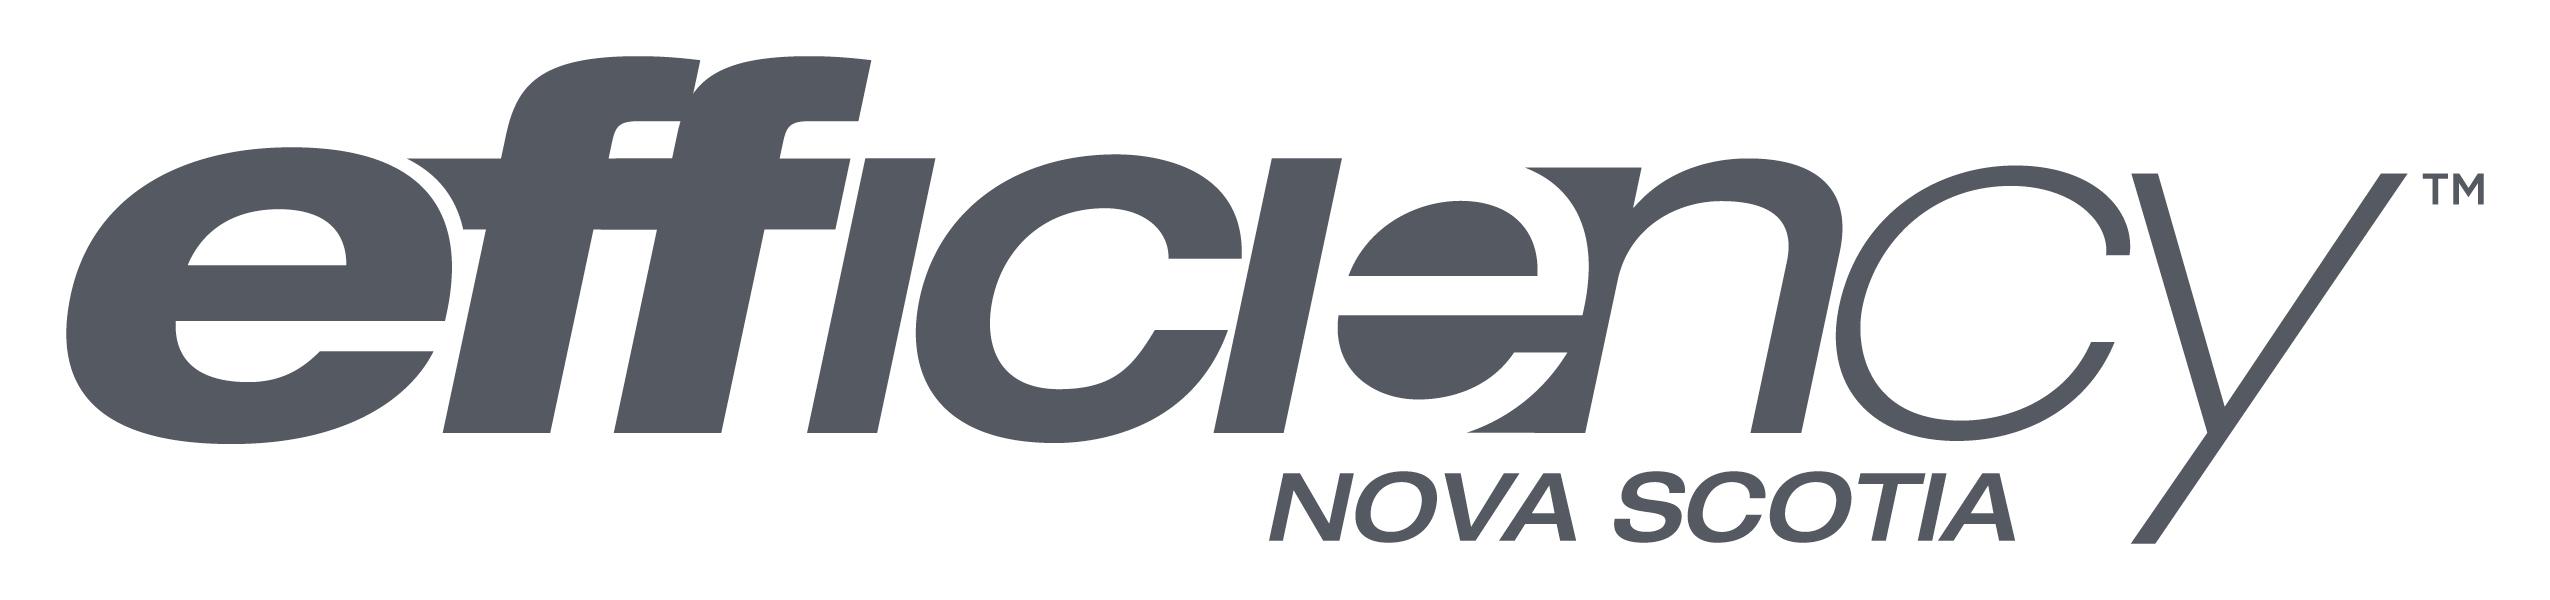 logo-efficiency-nova-scotia-rabais